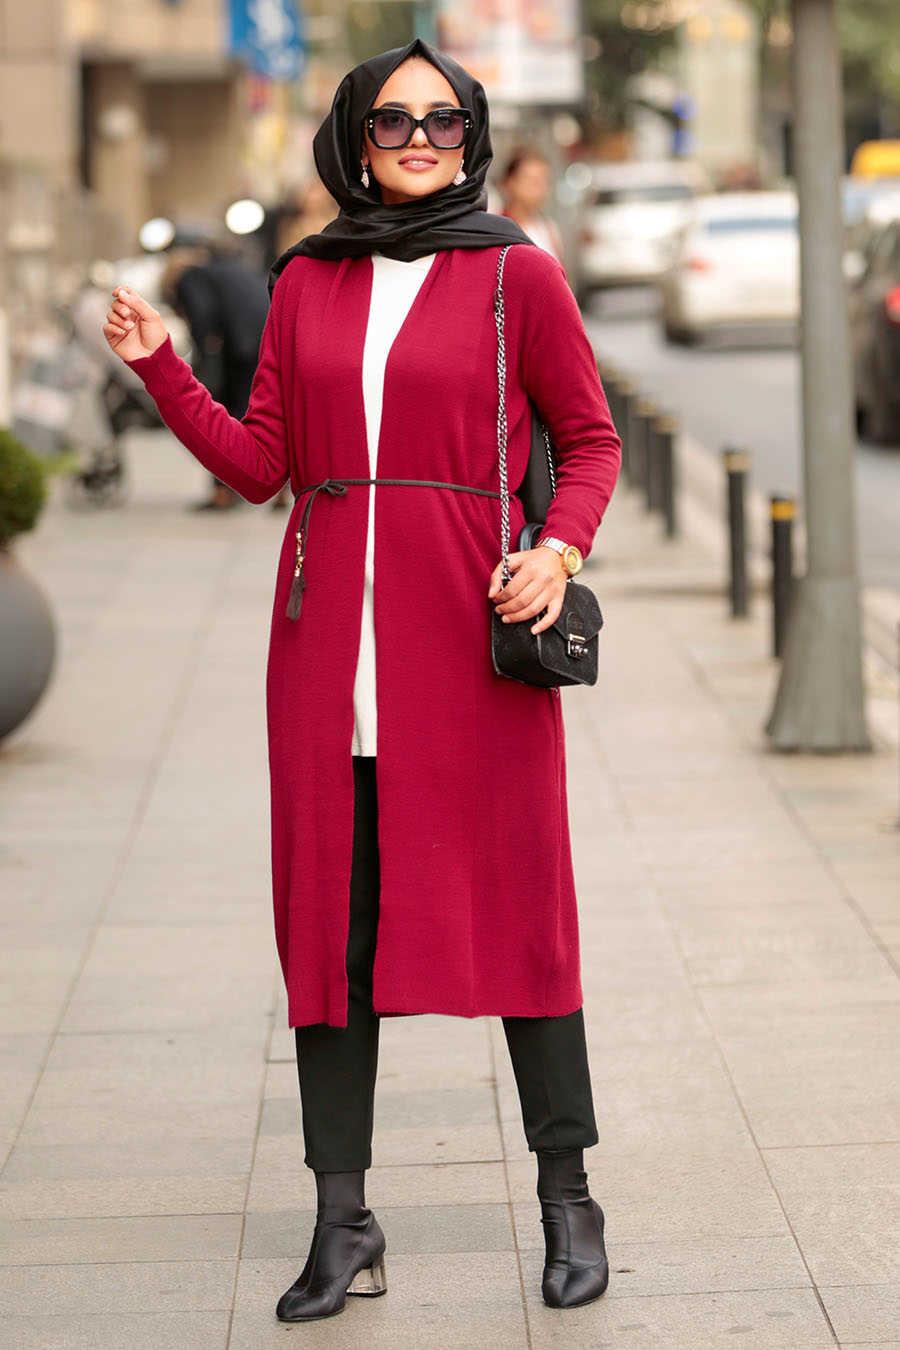 Neva Style - Claret Red Hijab Cardigan 15426BR